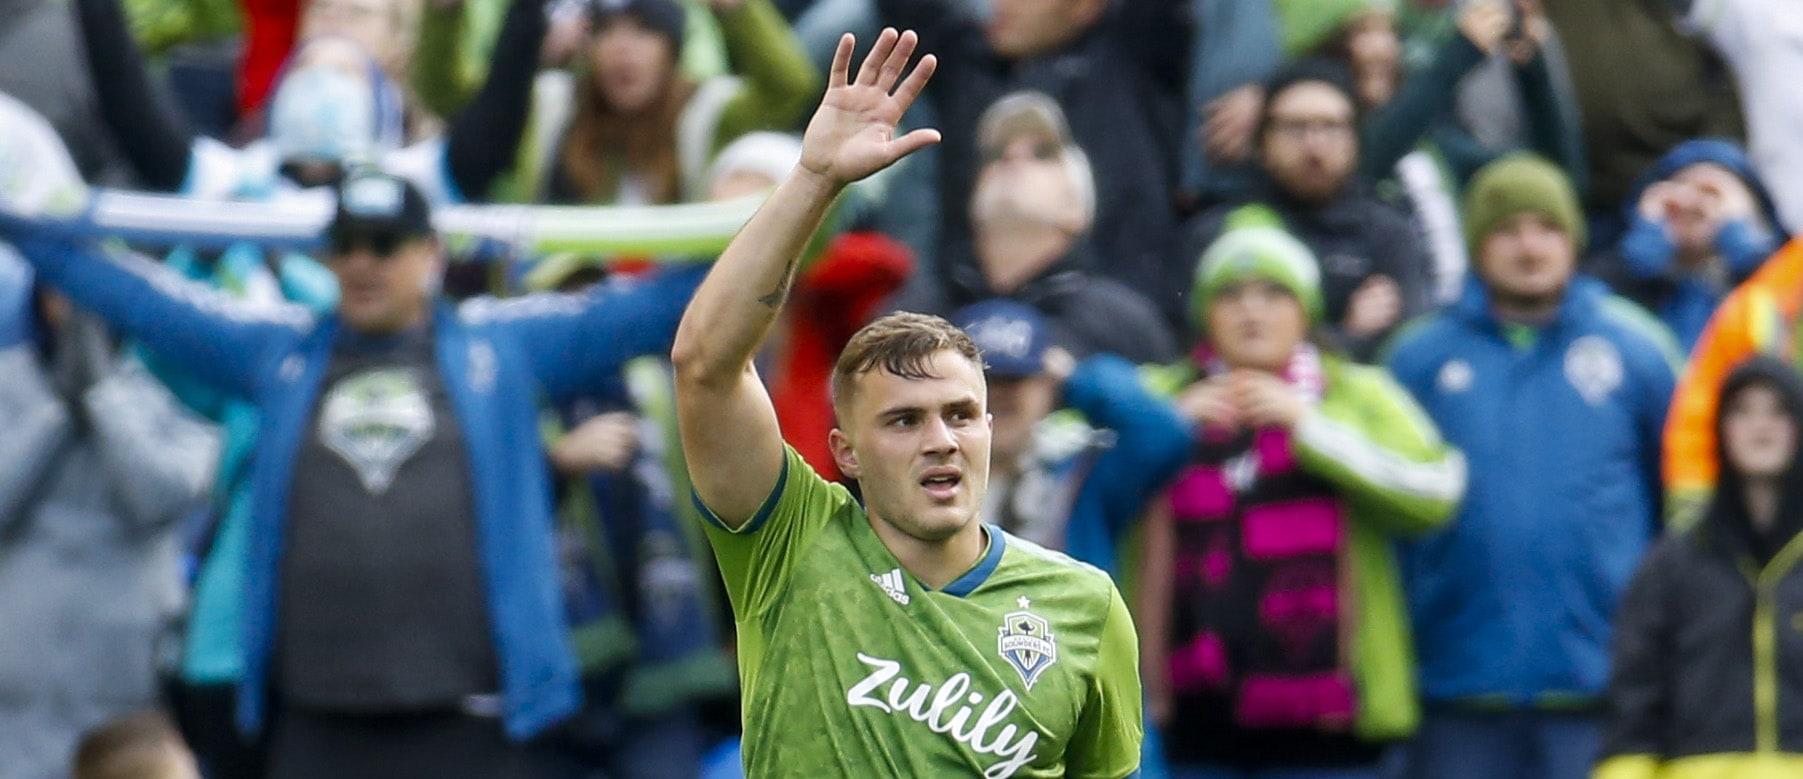 Seattle Sounders FC 2, Chicago Fire FC 1 | 2020 MLS Match Recap | MLSSoccer.com